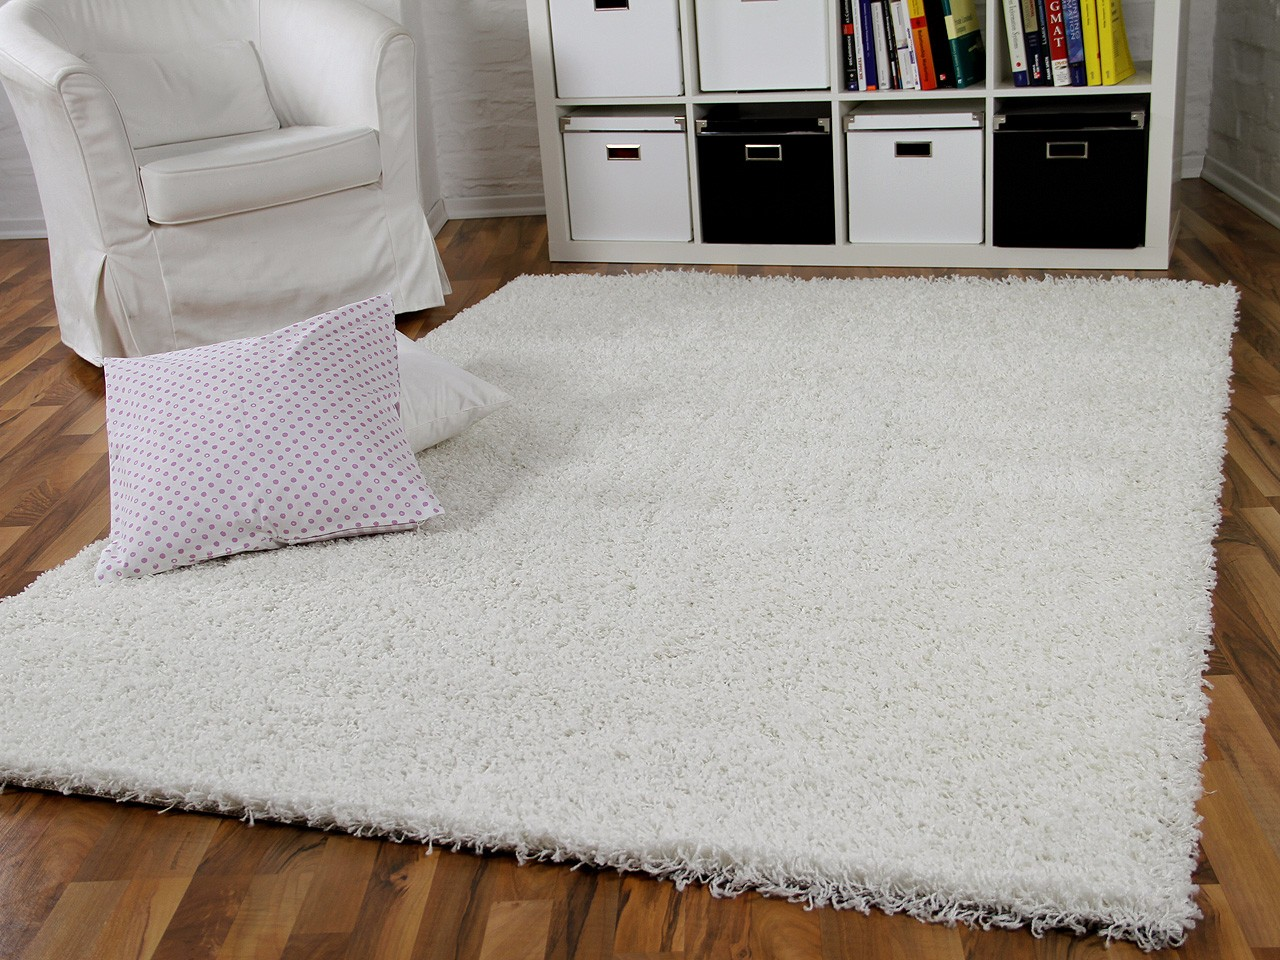 hochflor langflor shaggy teppich aloha wei teppiche. Black Bedroom Furniture Sets. Home Design Ideas